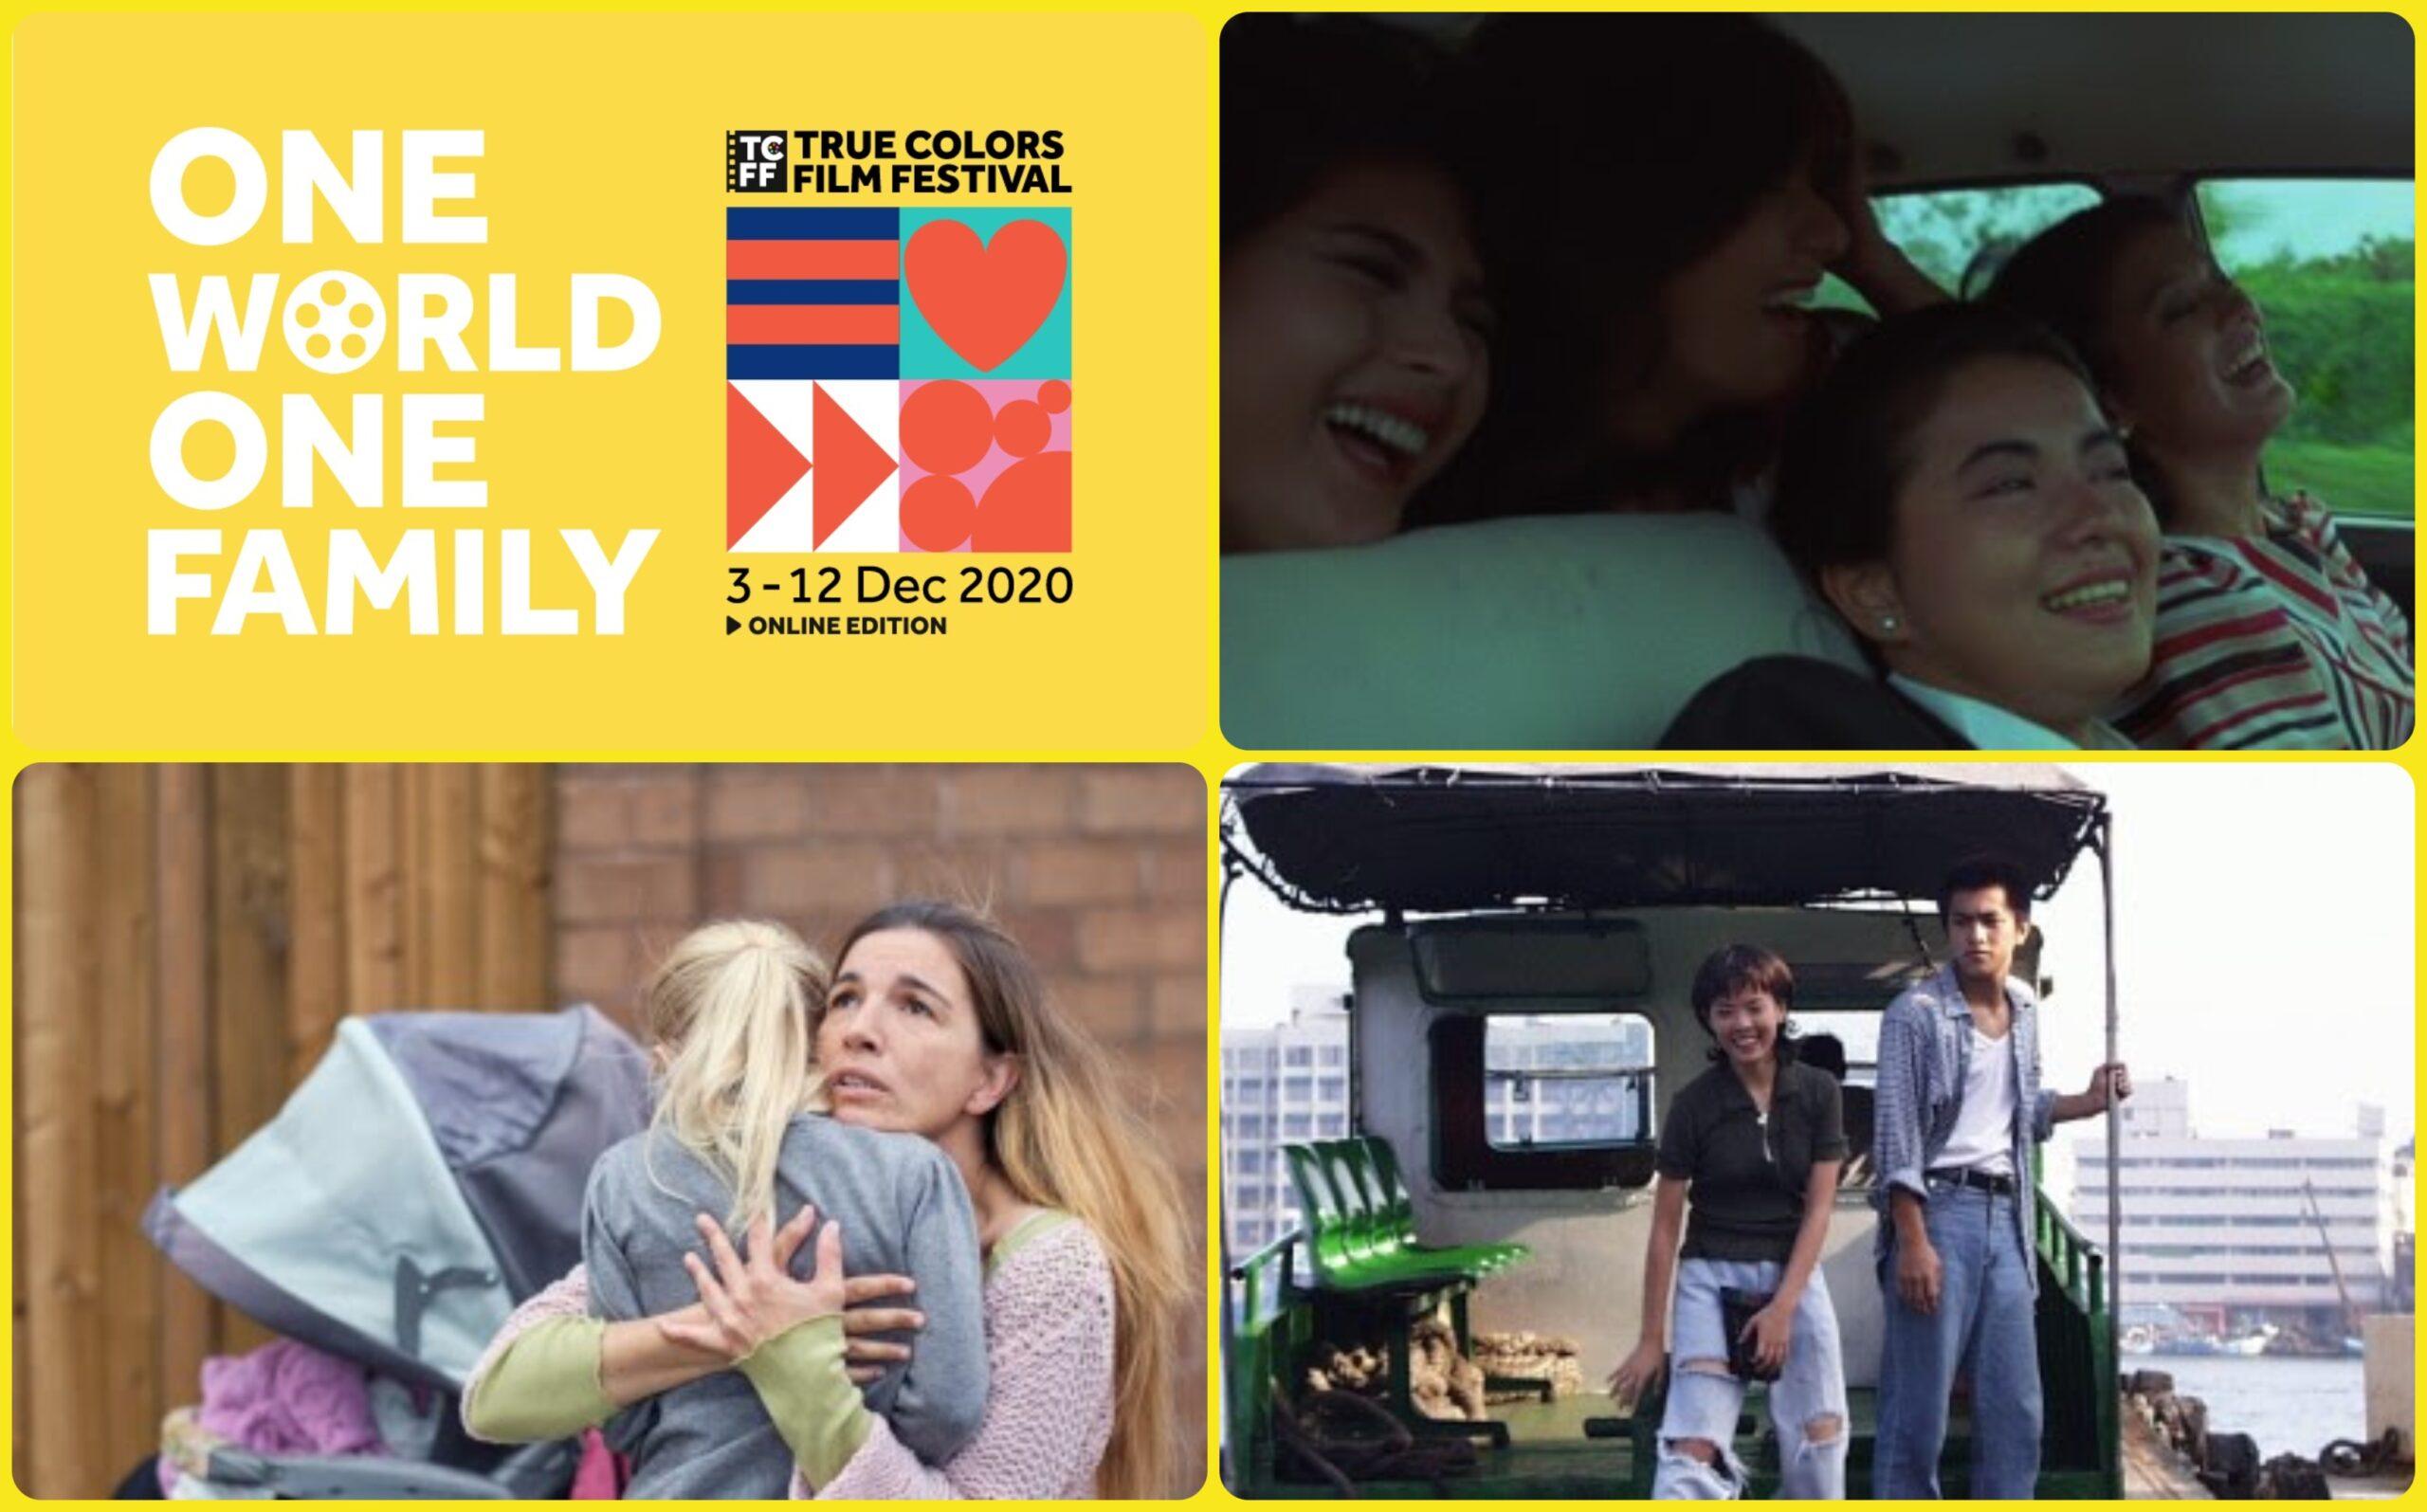 True Colors Film Festival 2020: 3 – 12 Dec 2020 (Online Edition)